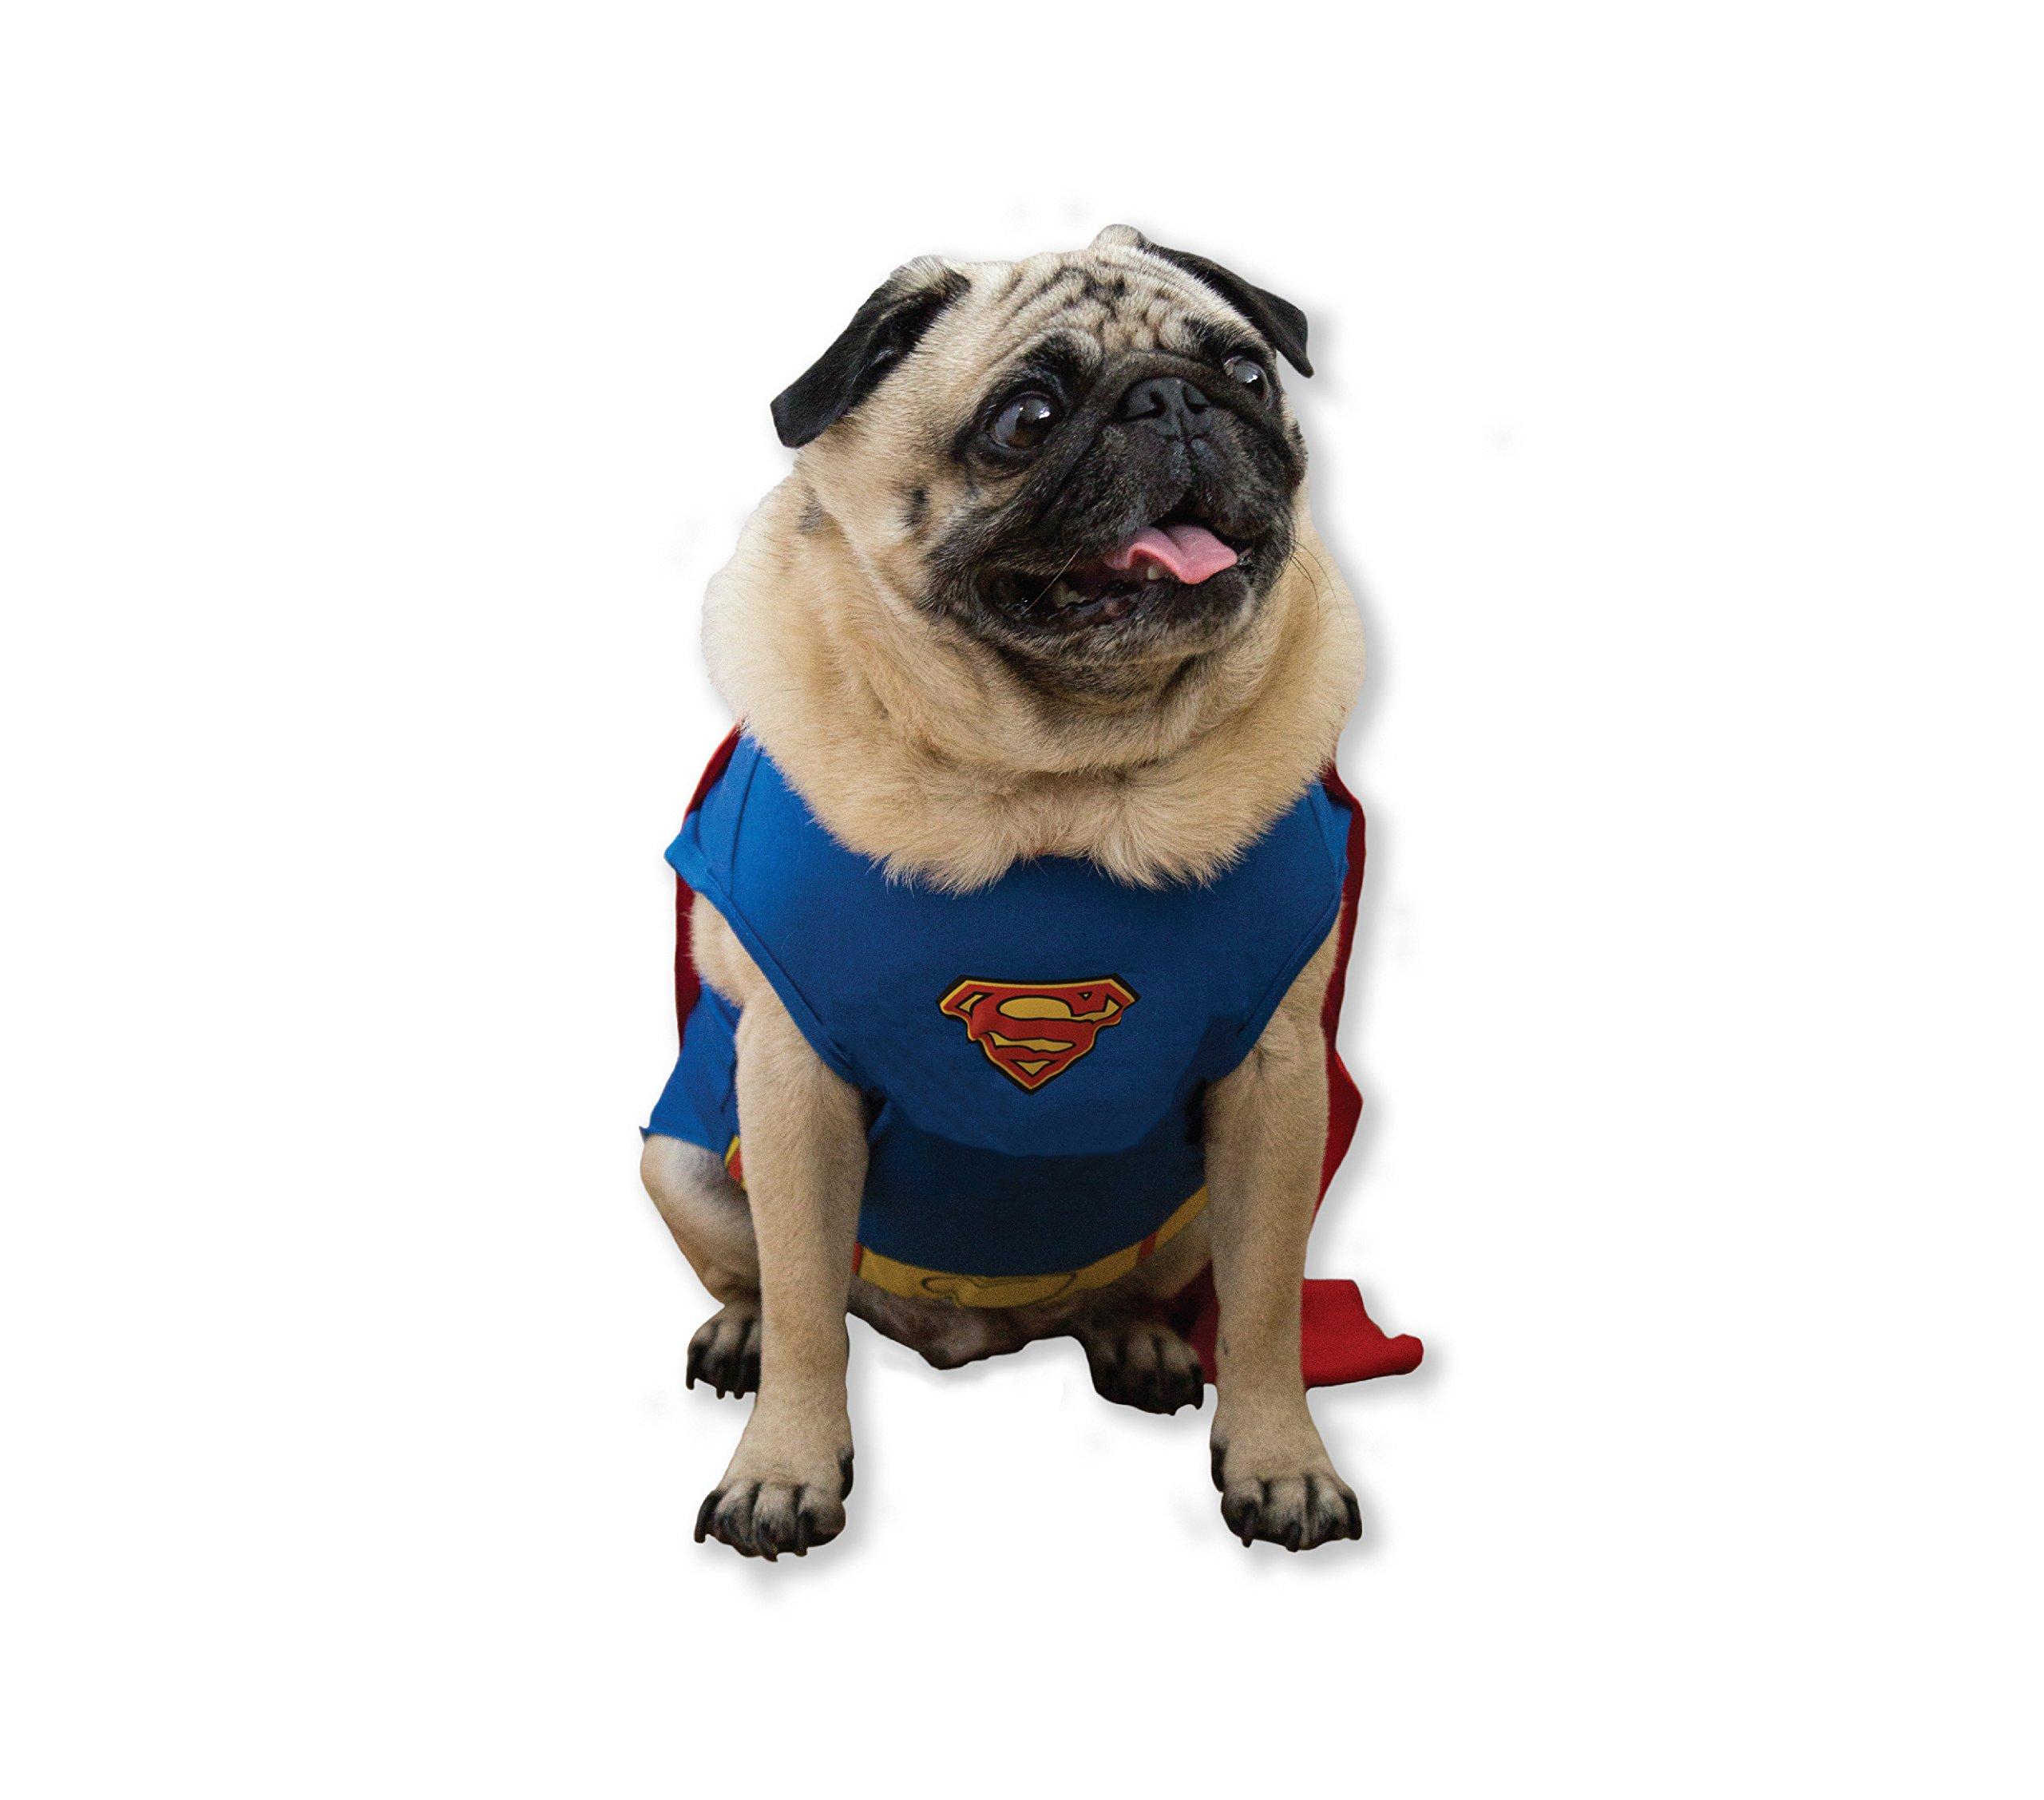 DC Comics Superman Dog Costume Red Cape, Medium | Best Superhero Dog Costume All Medium-Sized Dogs